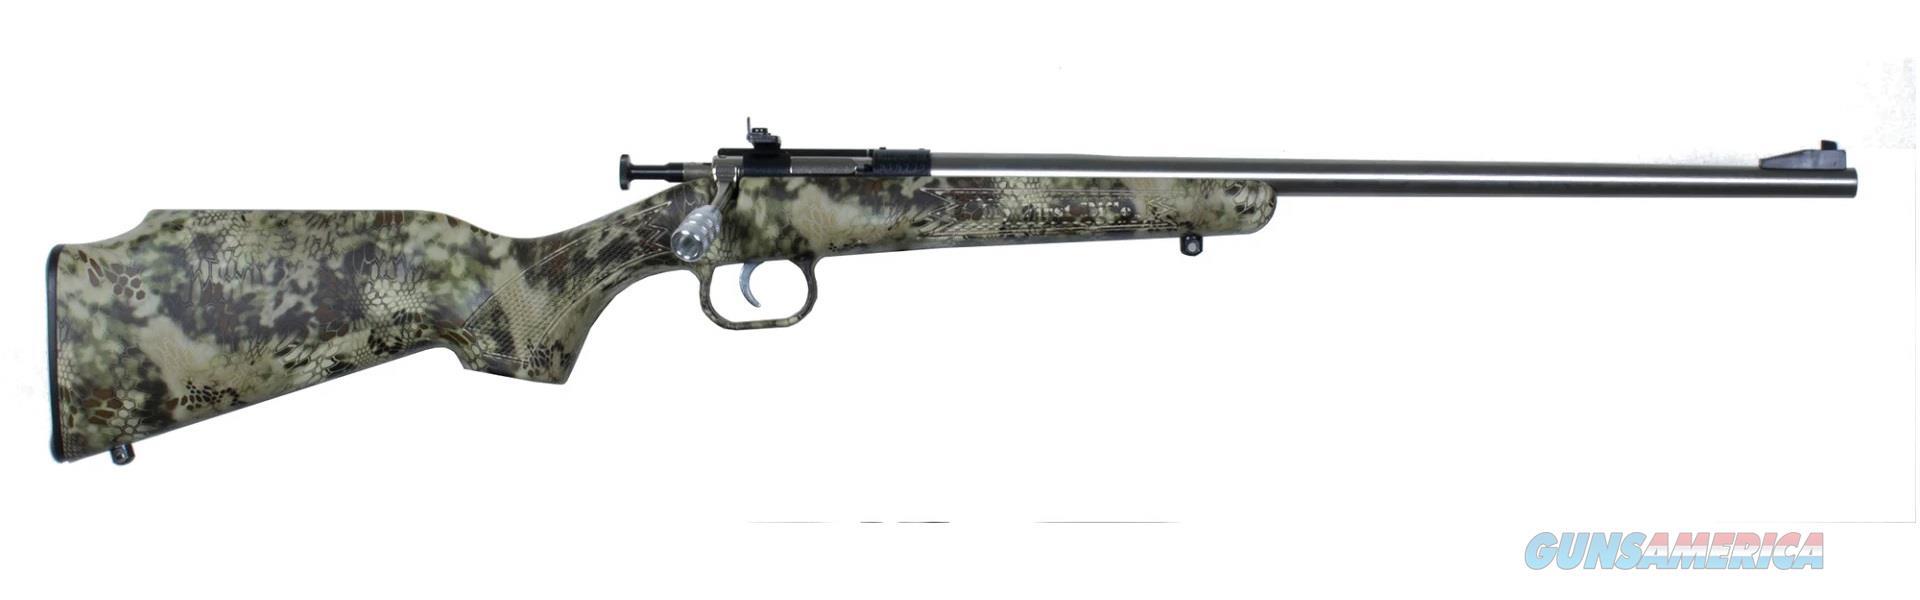 "Keystone 22Lr 16.125"" 1Rd 2158  Guns > Rifles > K Misc Rifles"